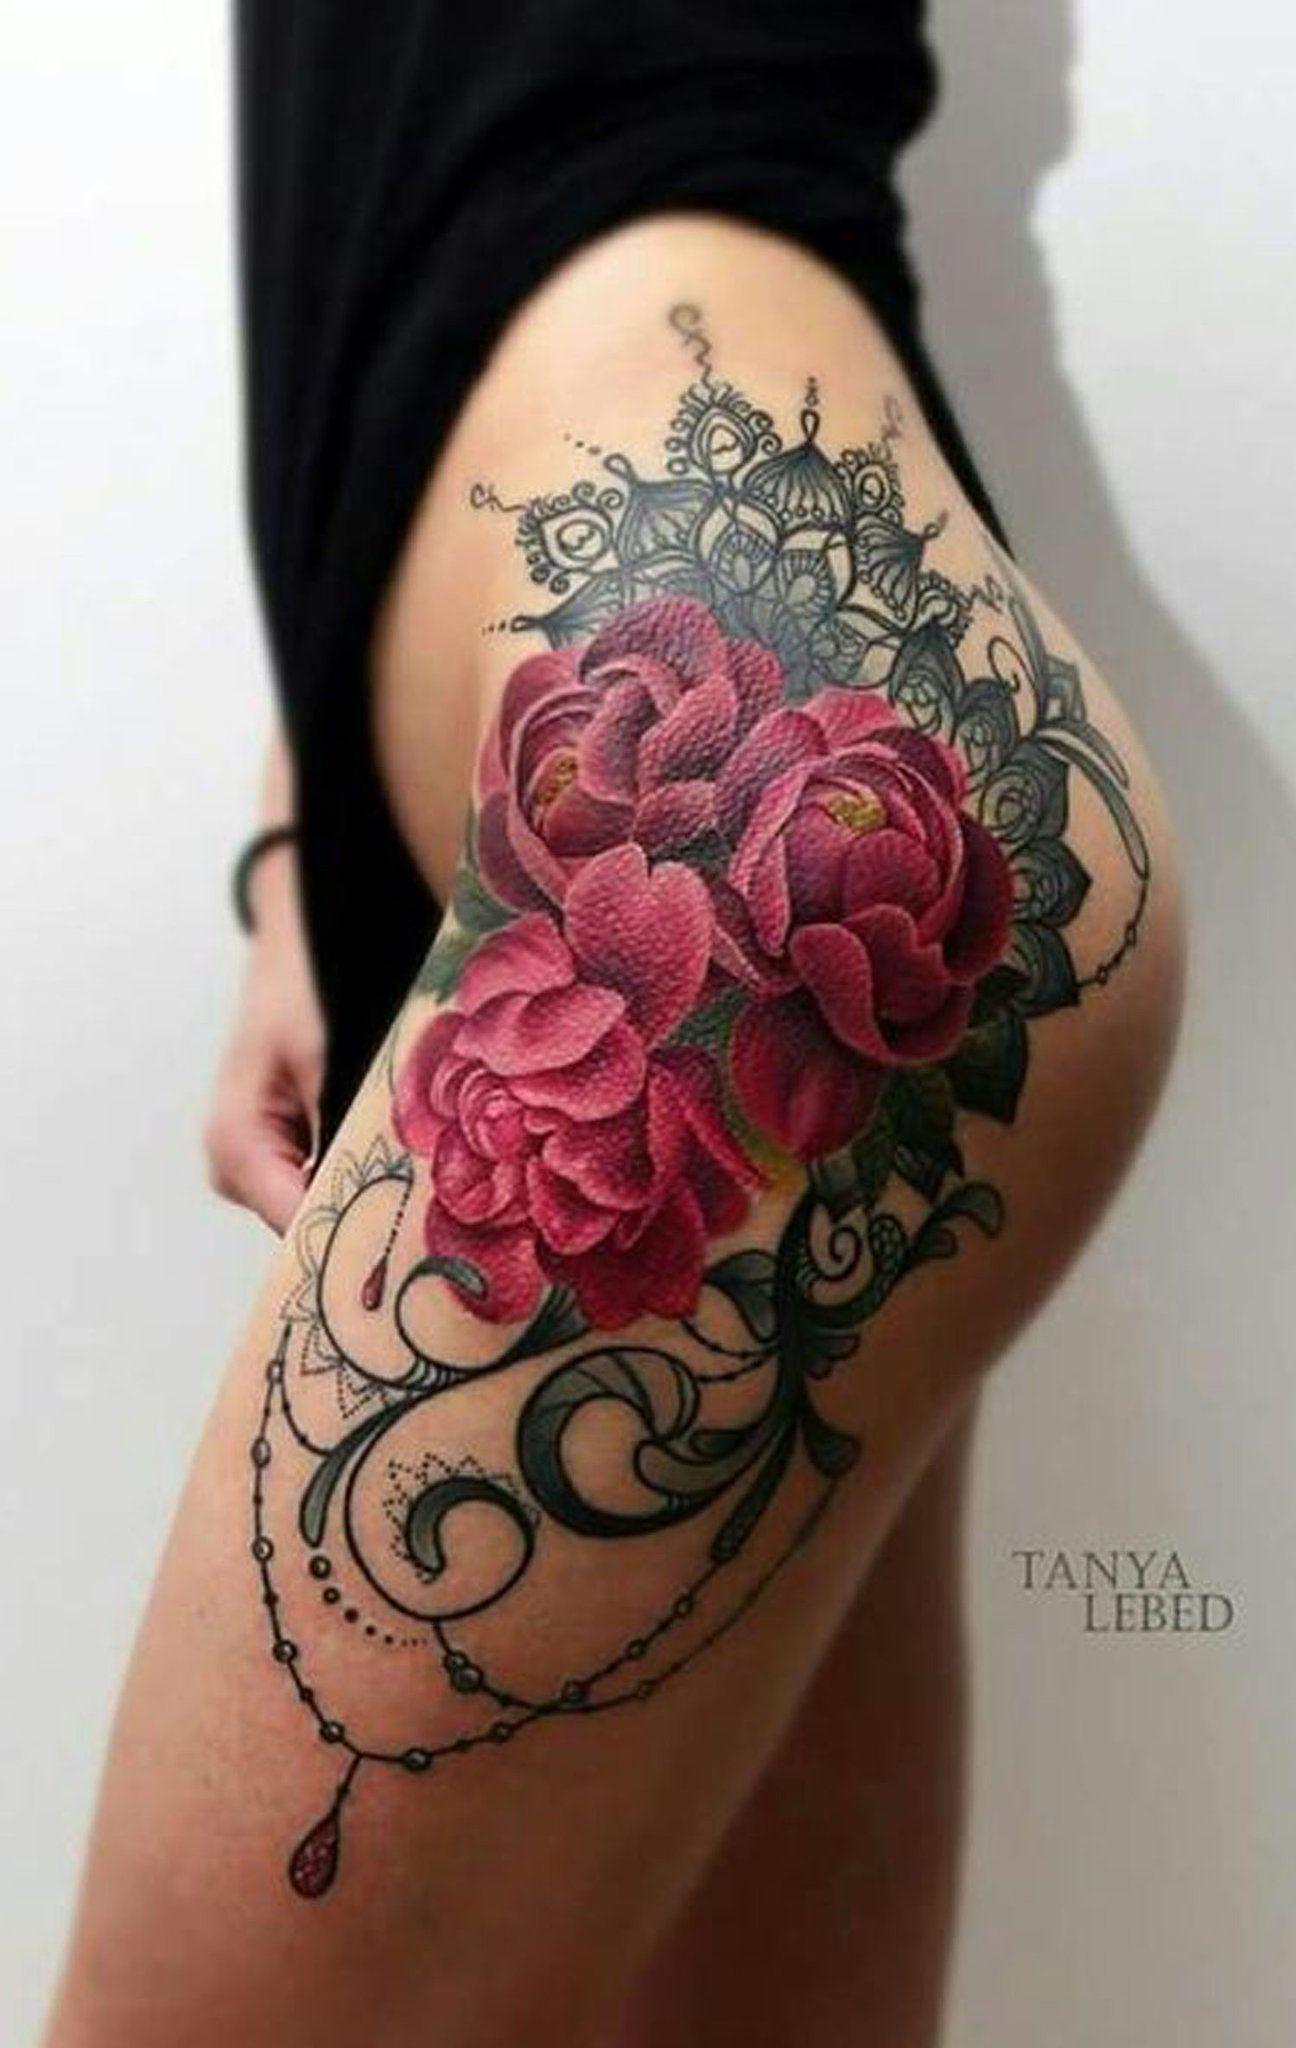 Watercolor Rose Thigh Tattoo Ideas At Mybodiart Com Black Lace Upper Leg Tatt Rose Tattoo Thigh Thigh Tattoos Women Lace Thigh Tattoos